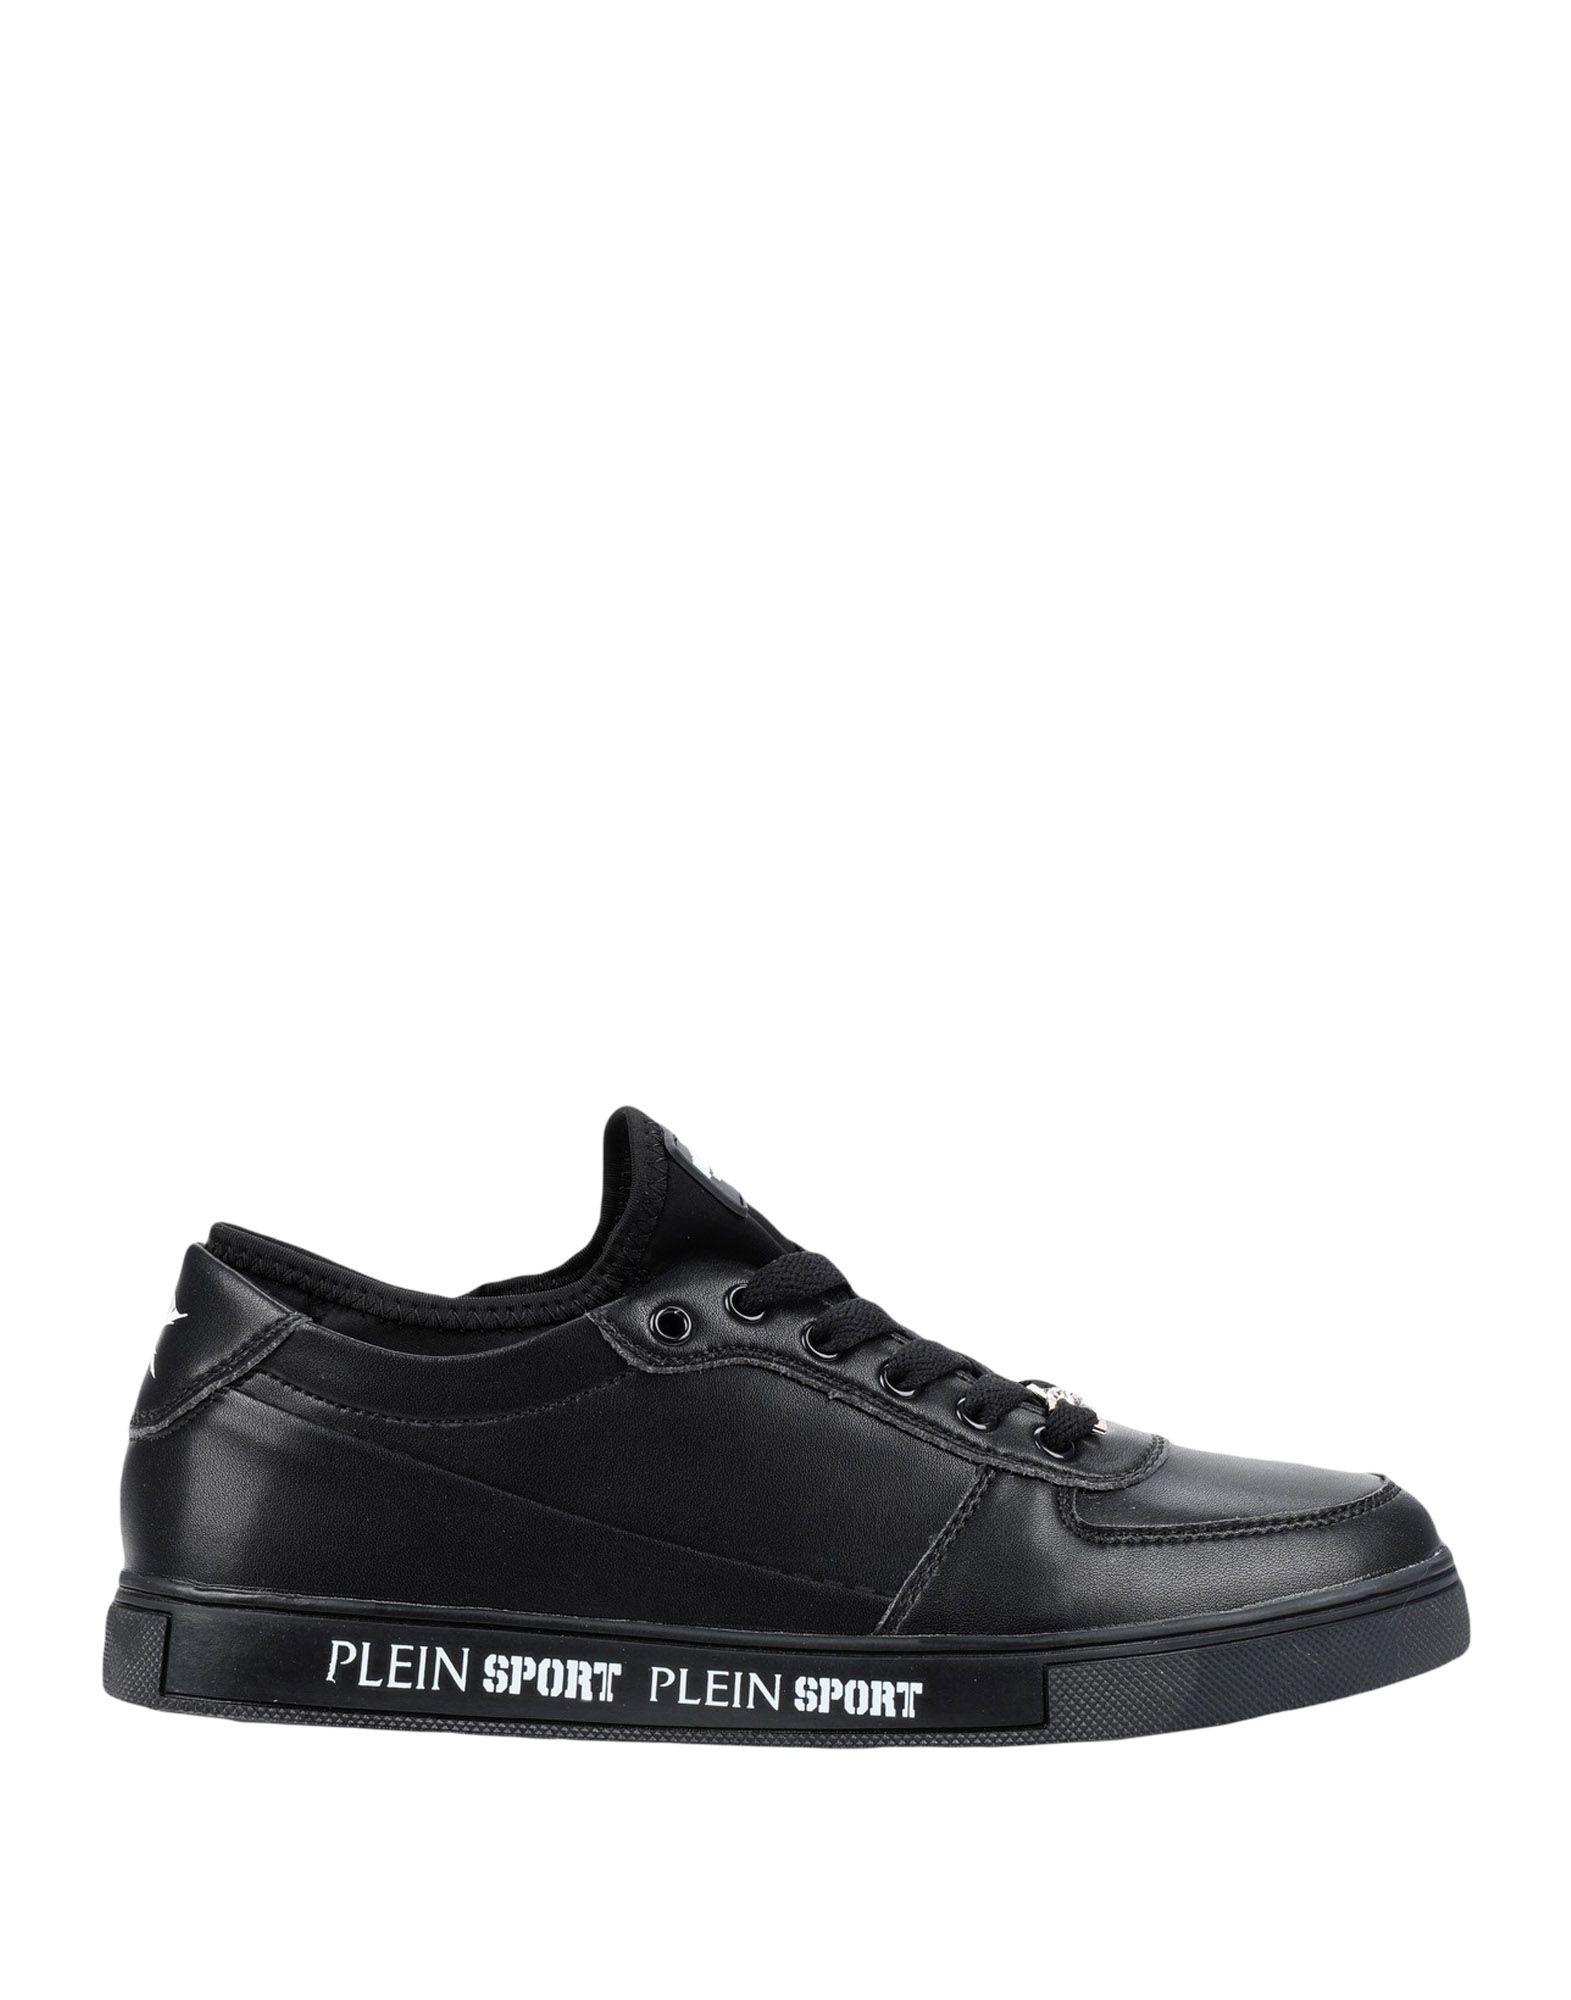 Sneakers Plein Sport Lo-Top Sneakers Ellene - Donna - Acquista online su